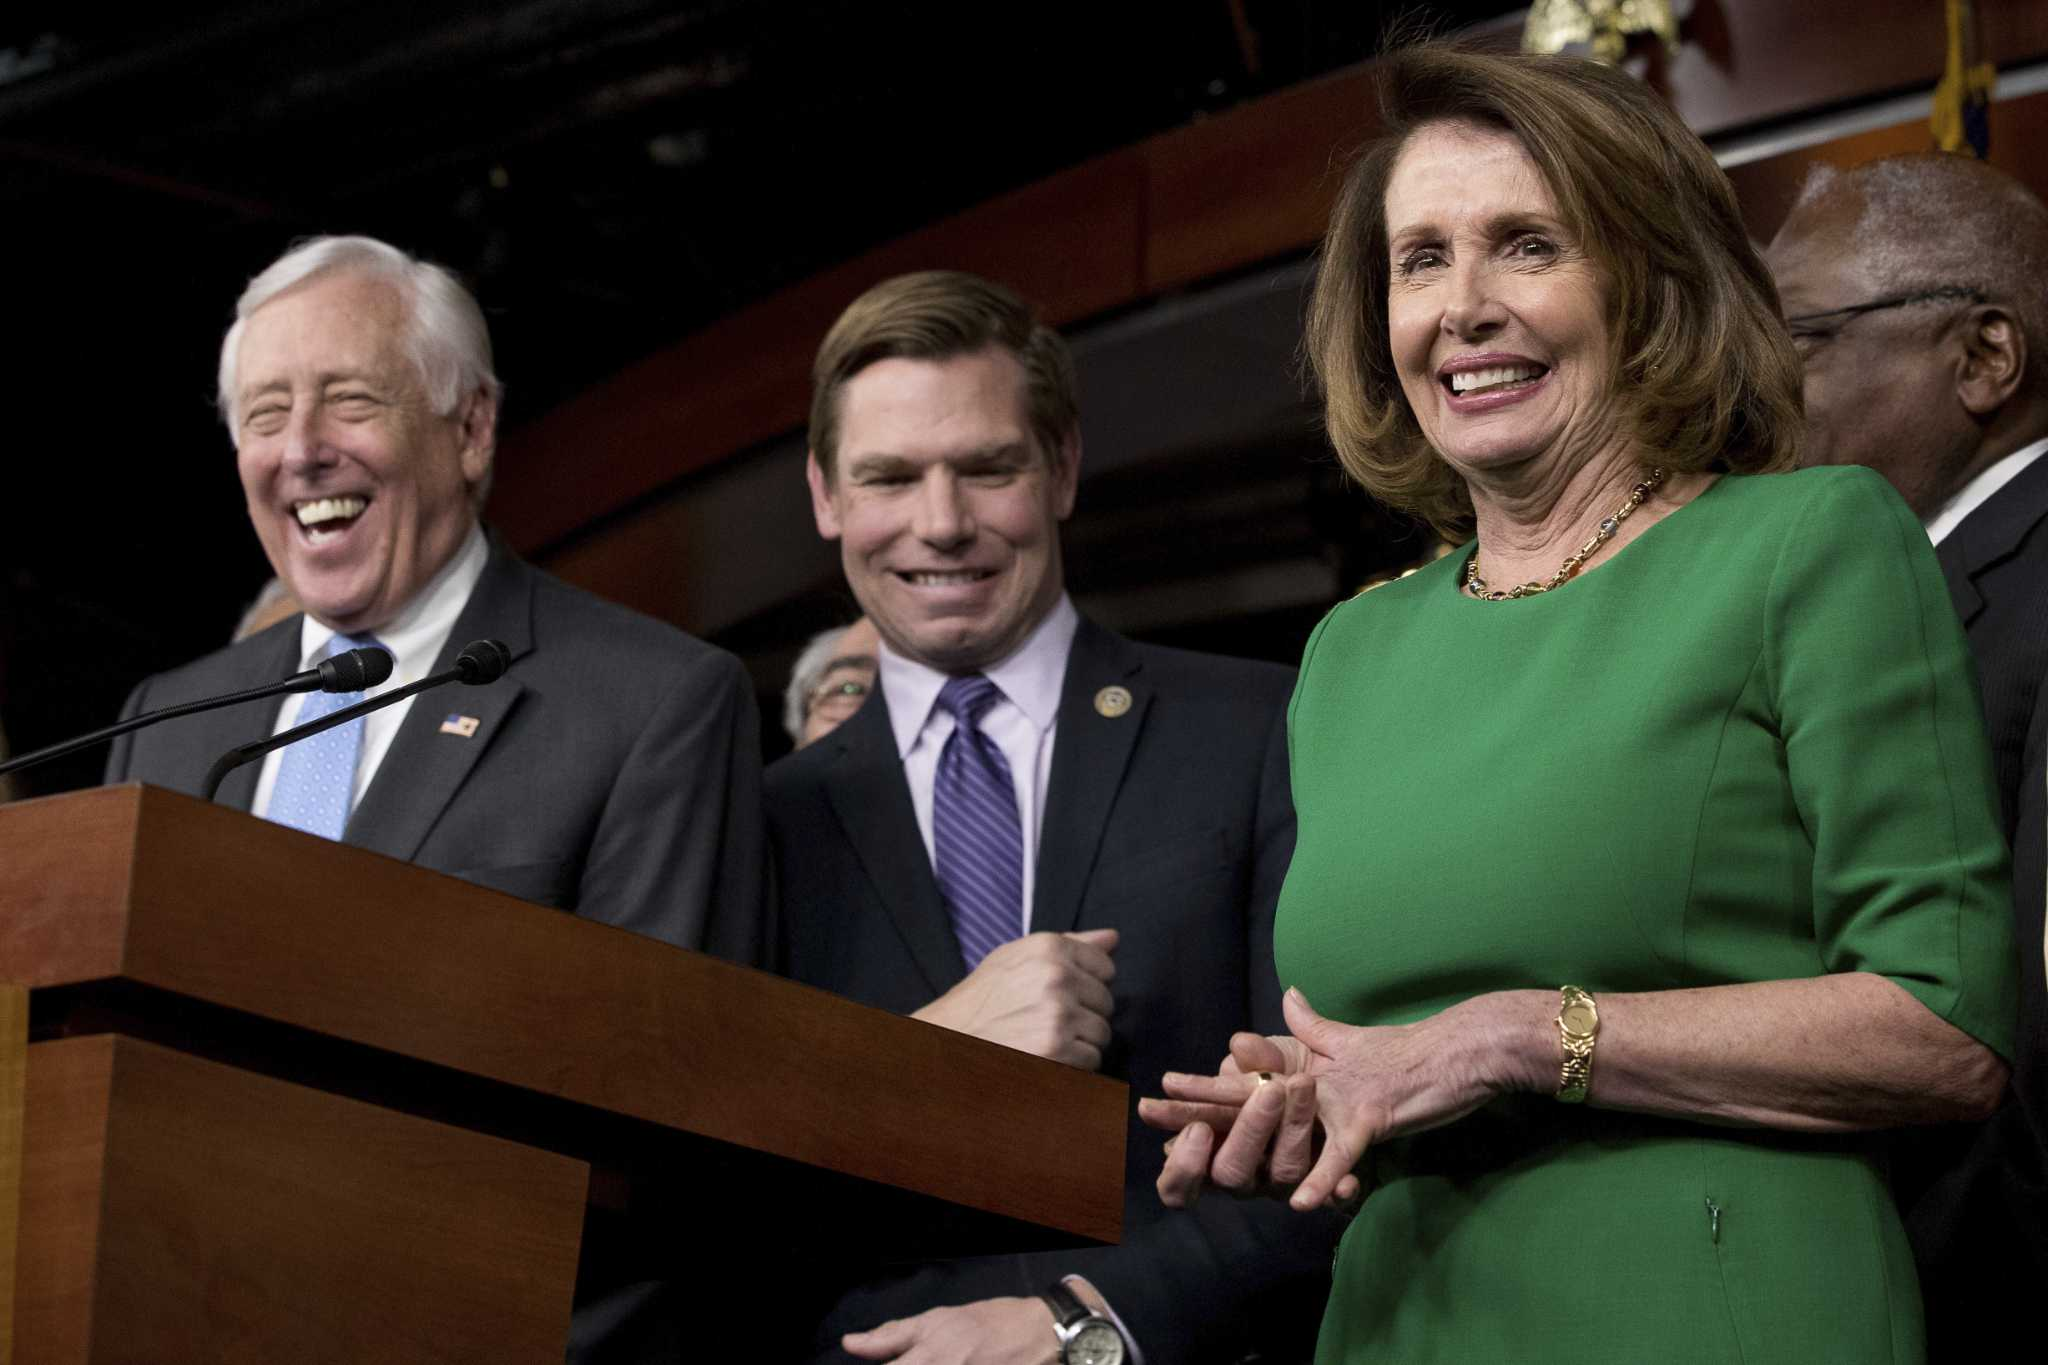 Top House Democrats show increasing confidence in retaking majority - SFGate